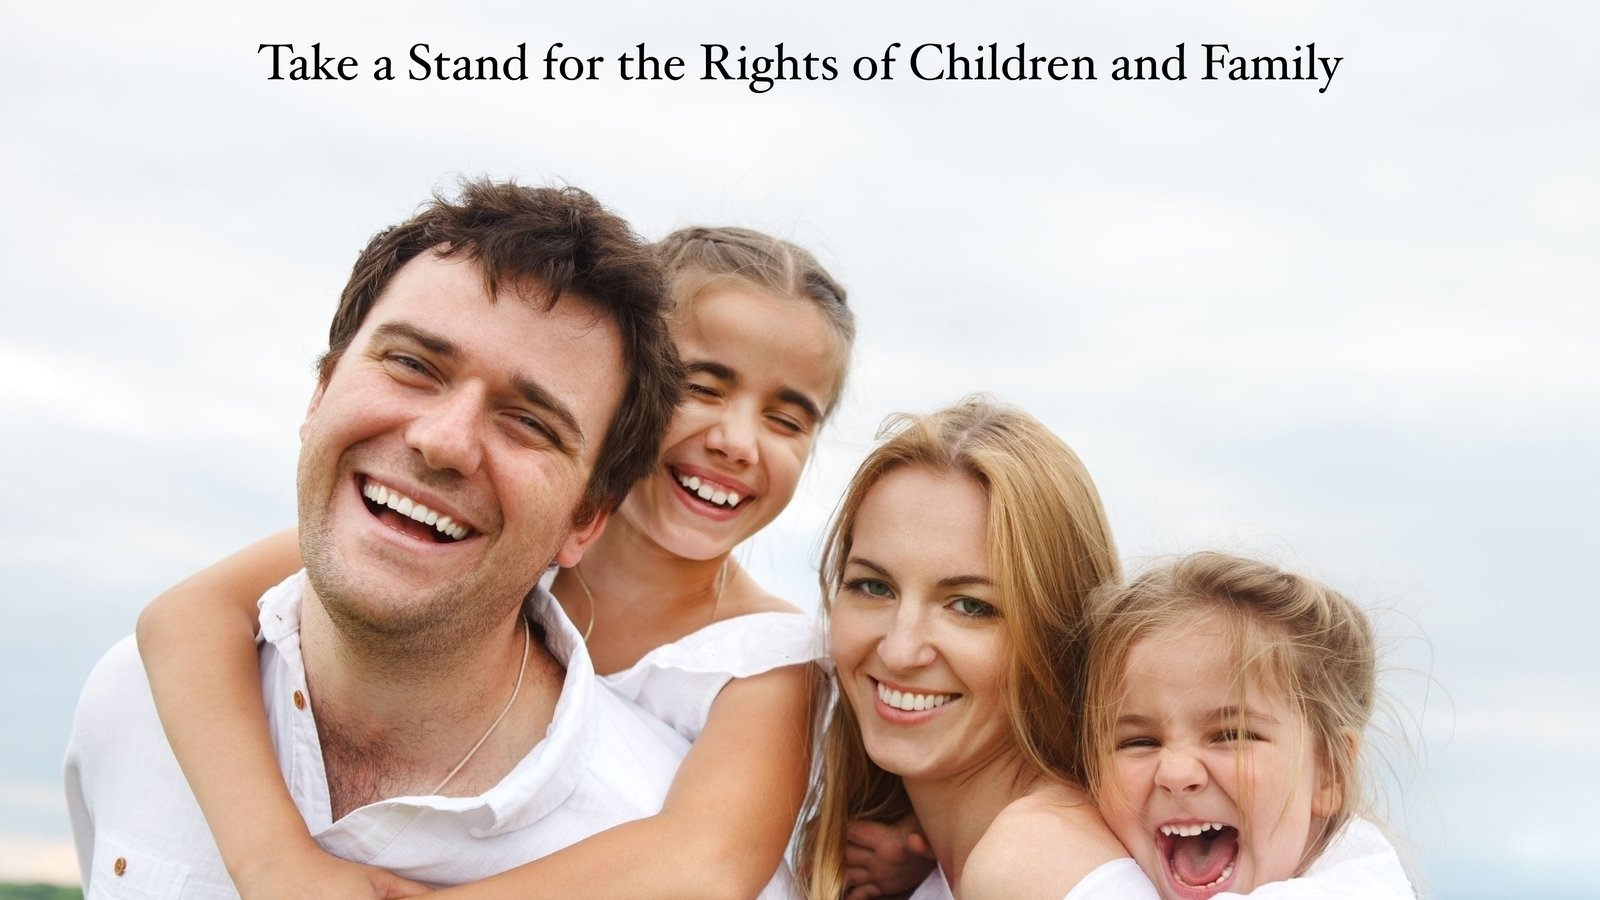 Supporter comments · Ohio State Senate: Stop Child Sex